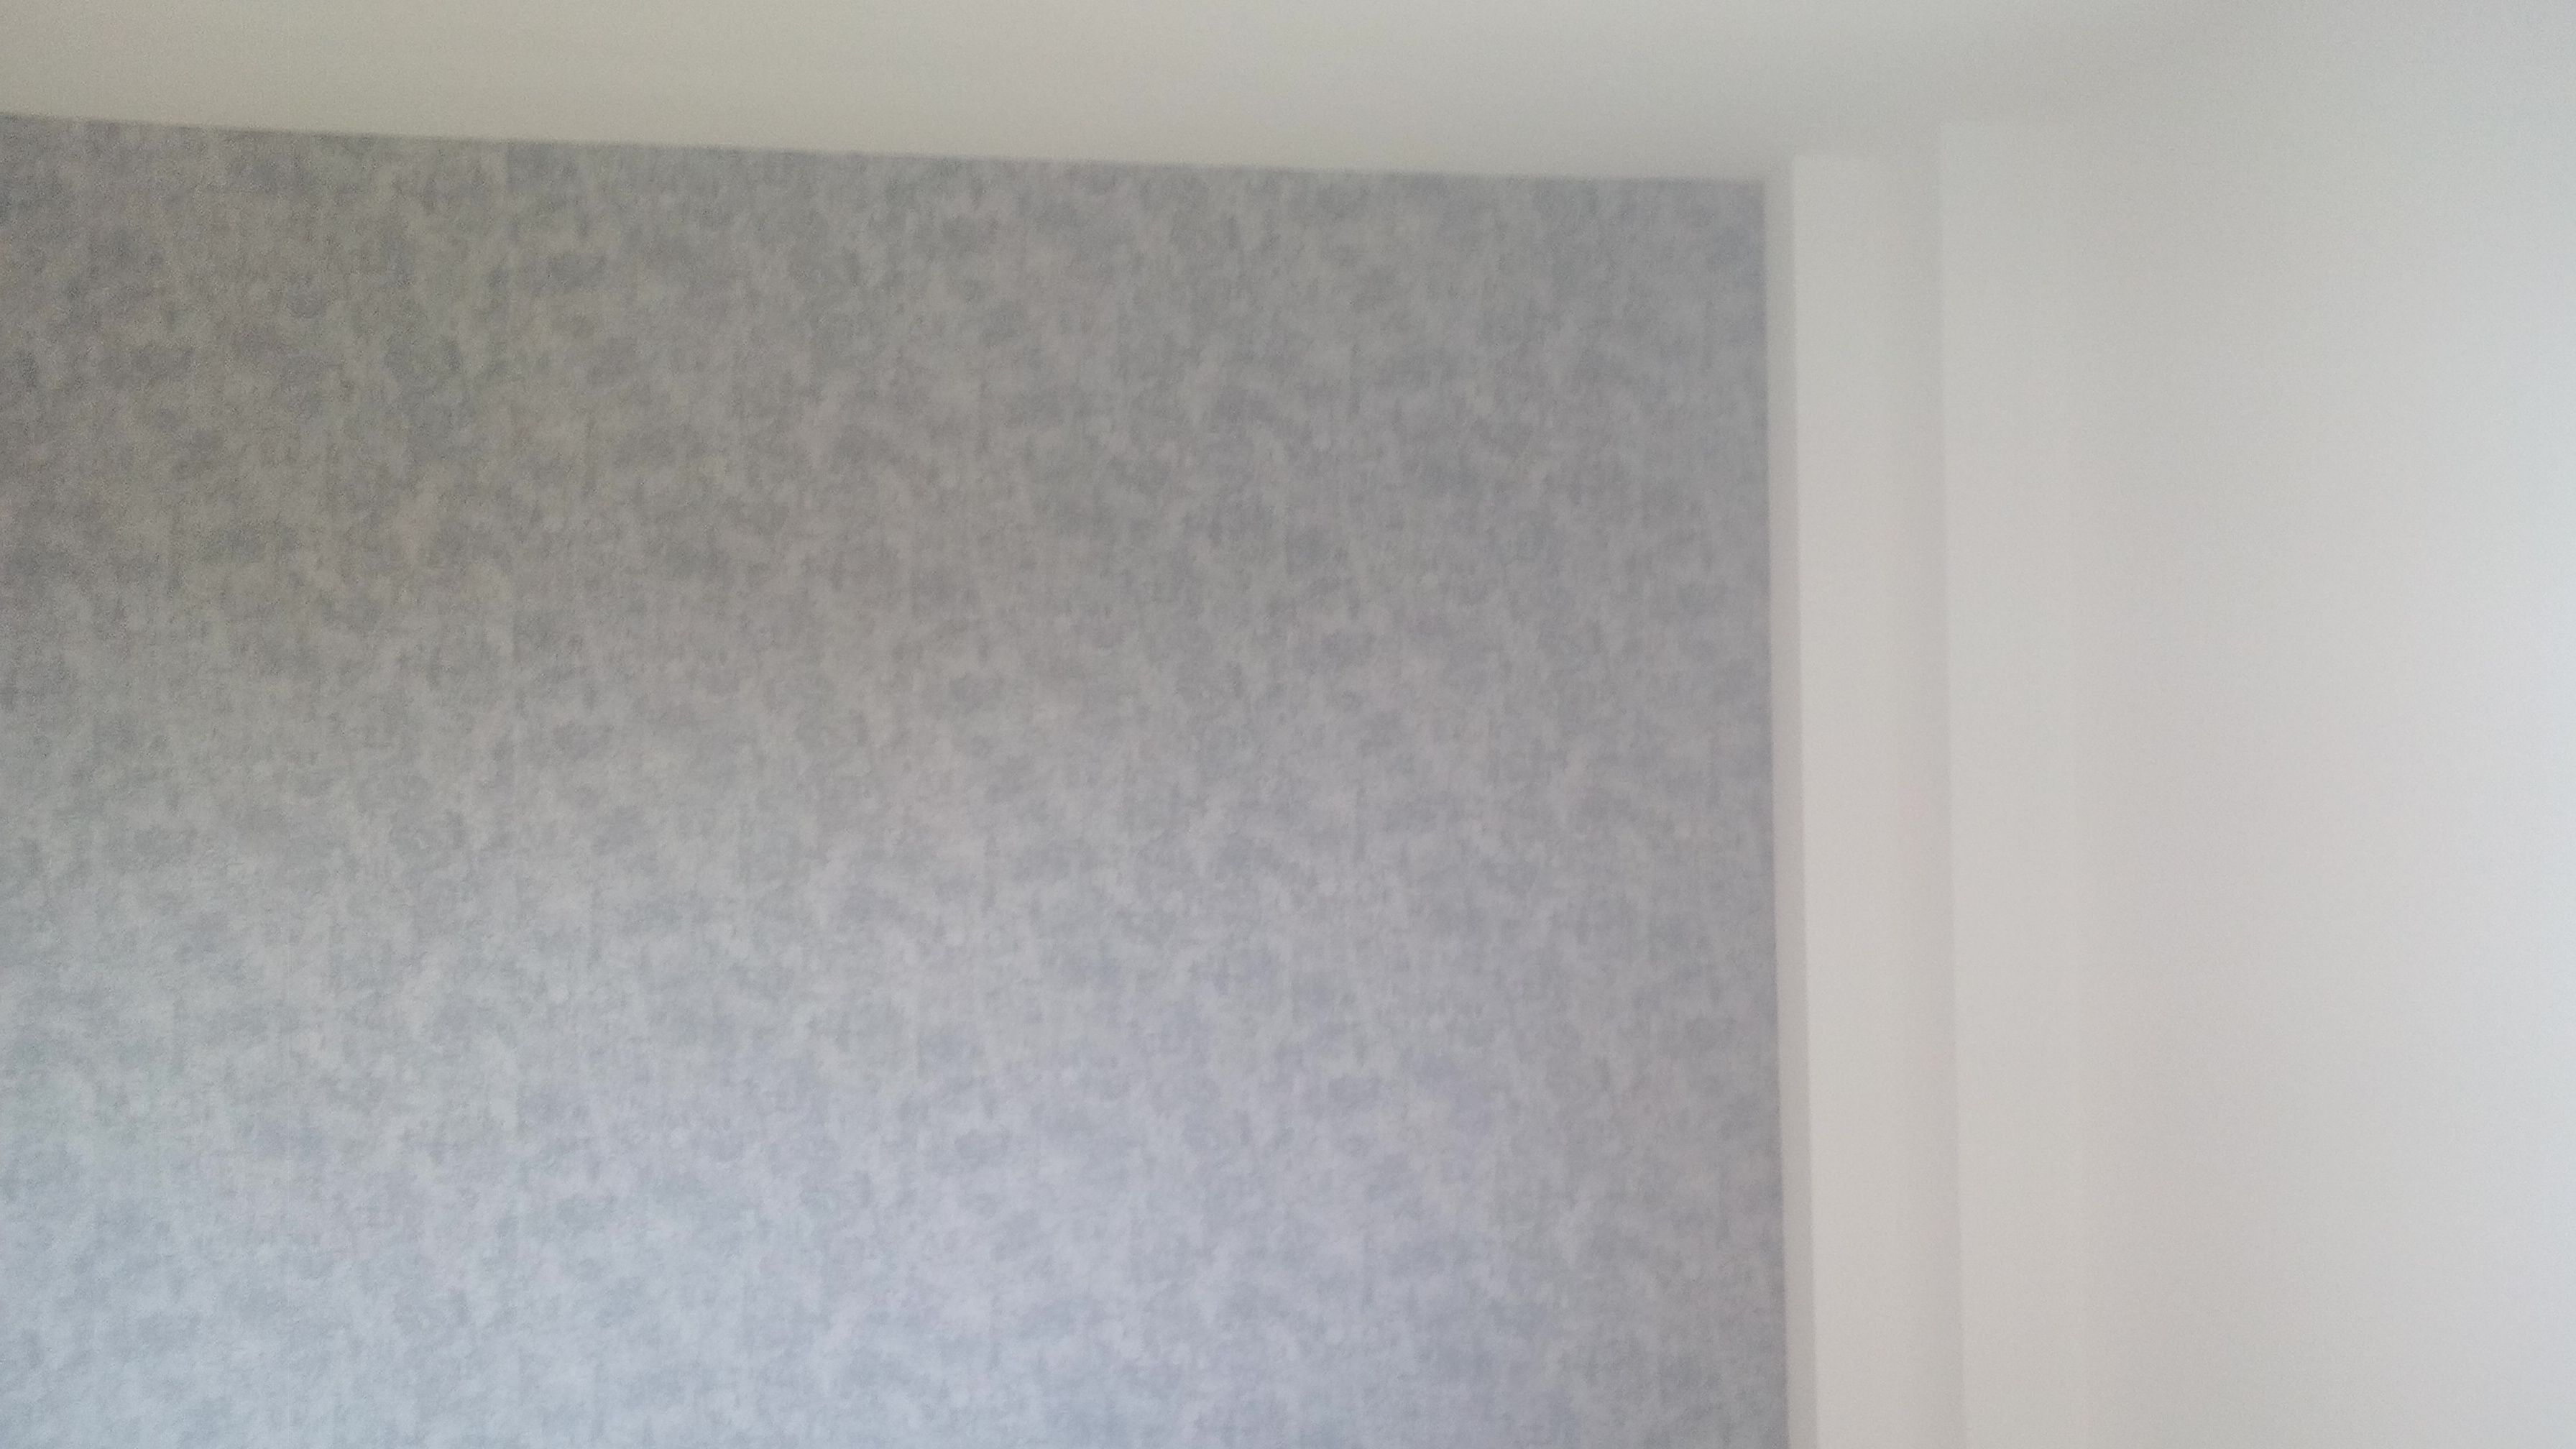 Pinturas urbano pintores en madrid pintor en madrid pintores madrid pintor madrid - Papel pintado gris ...